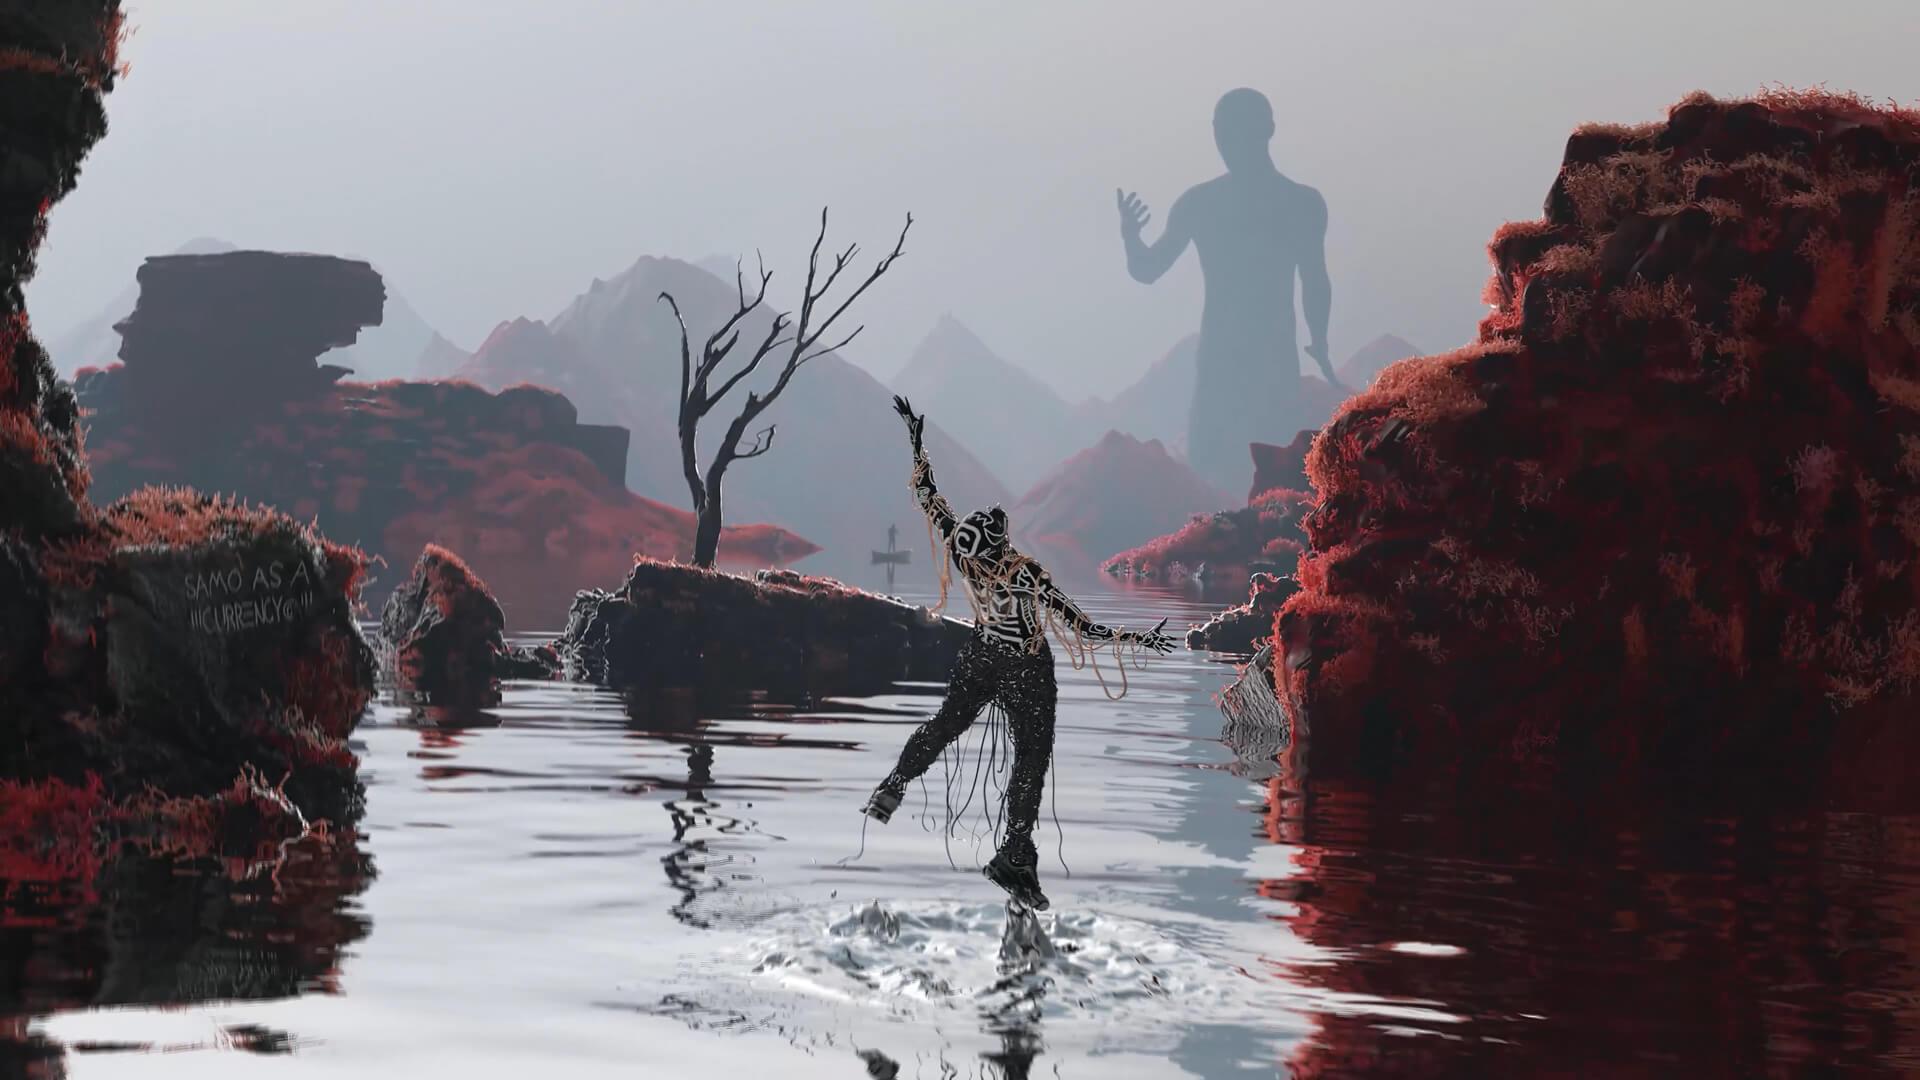 Exploring the fascinating world of artist Steven Baltay